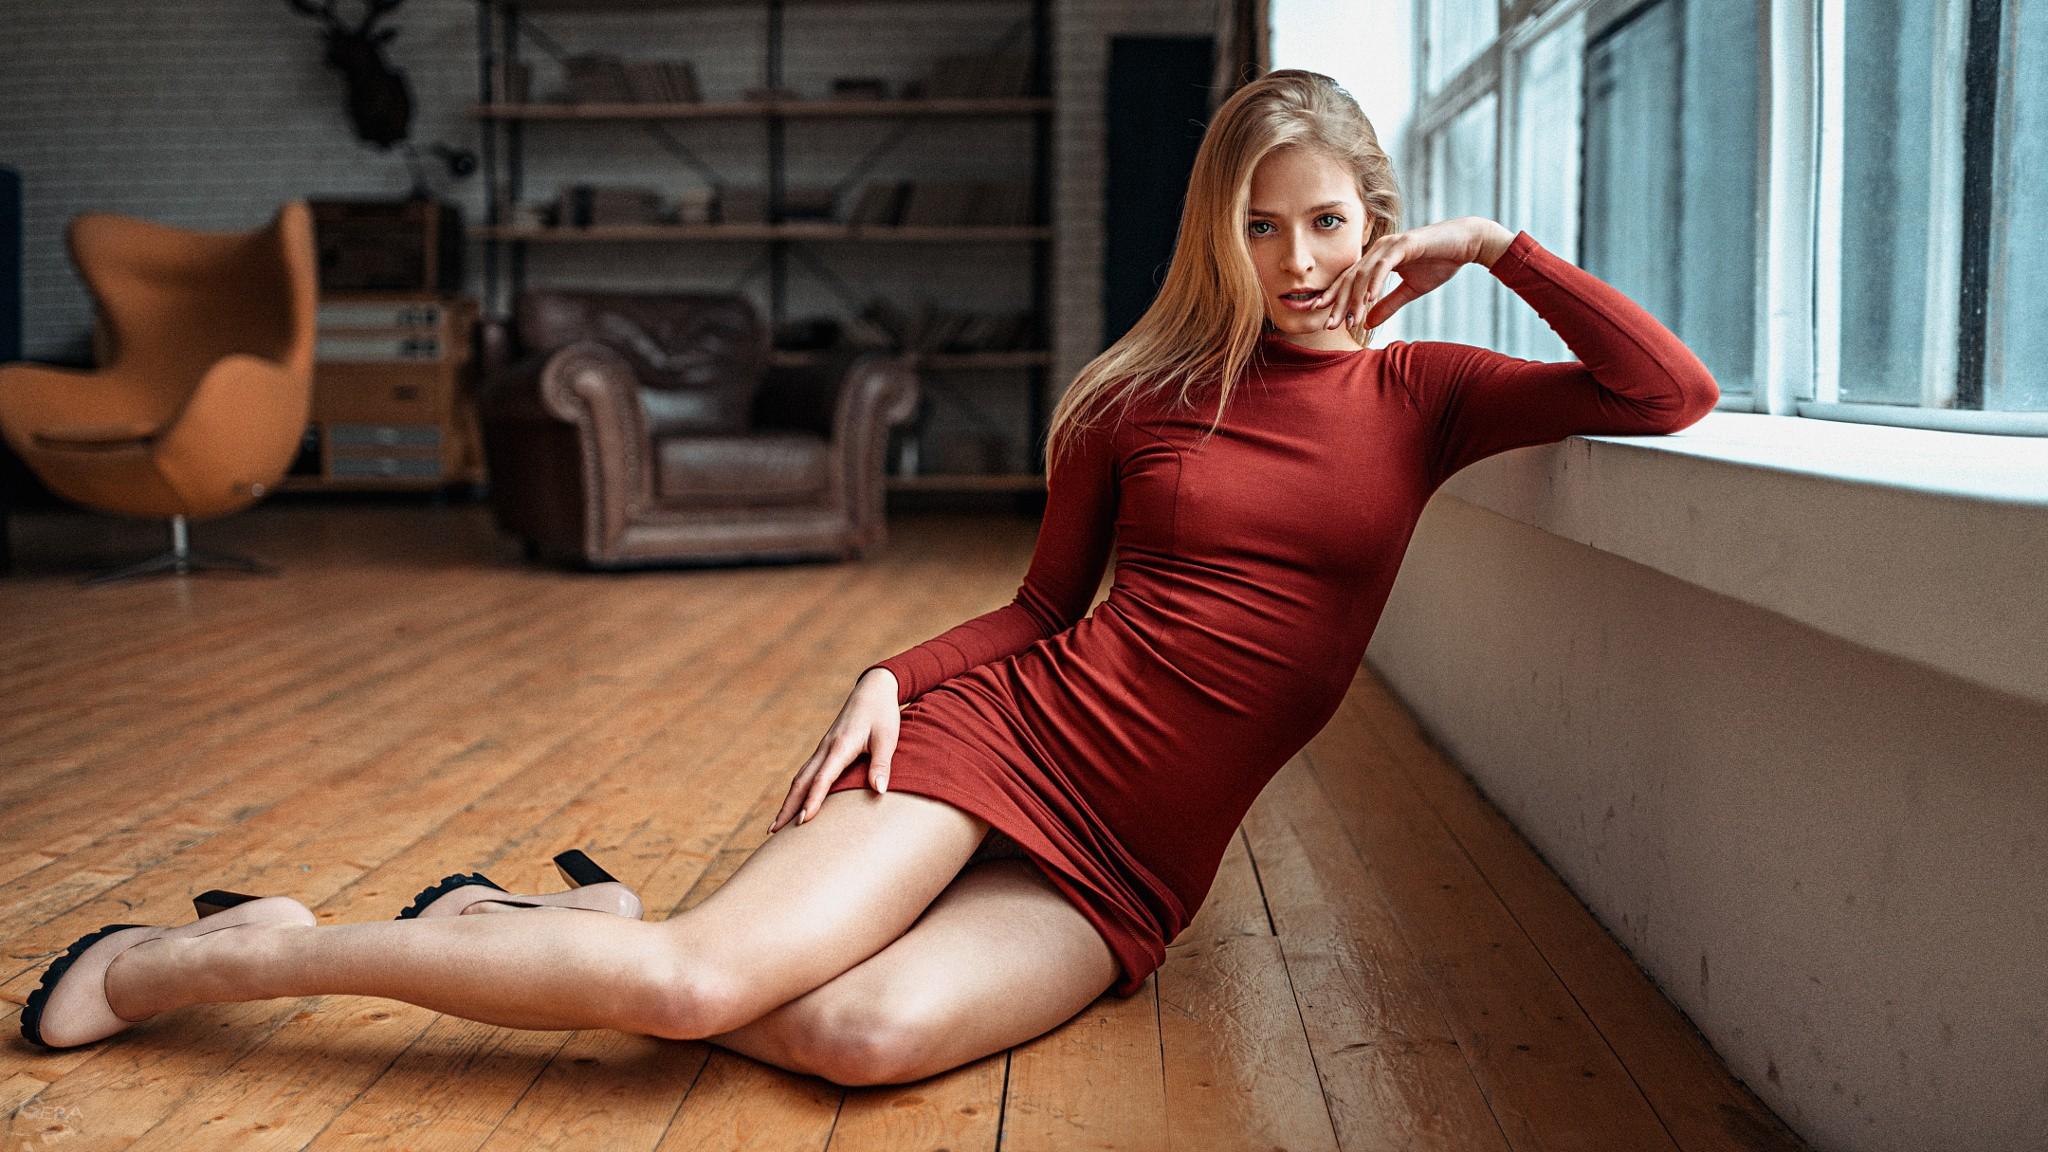 Sexy legs babe 8